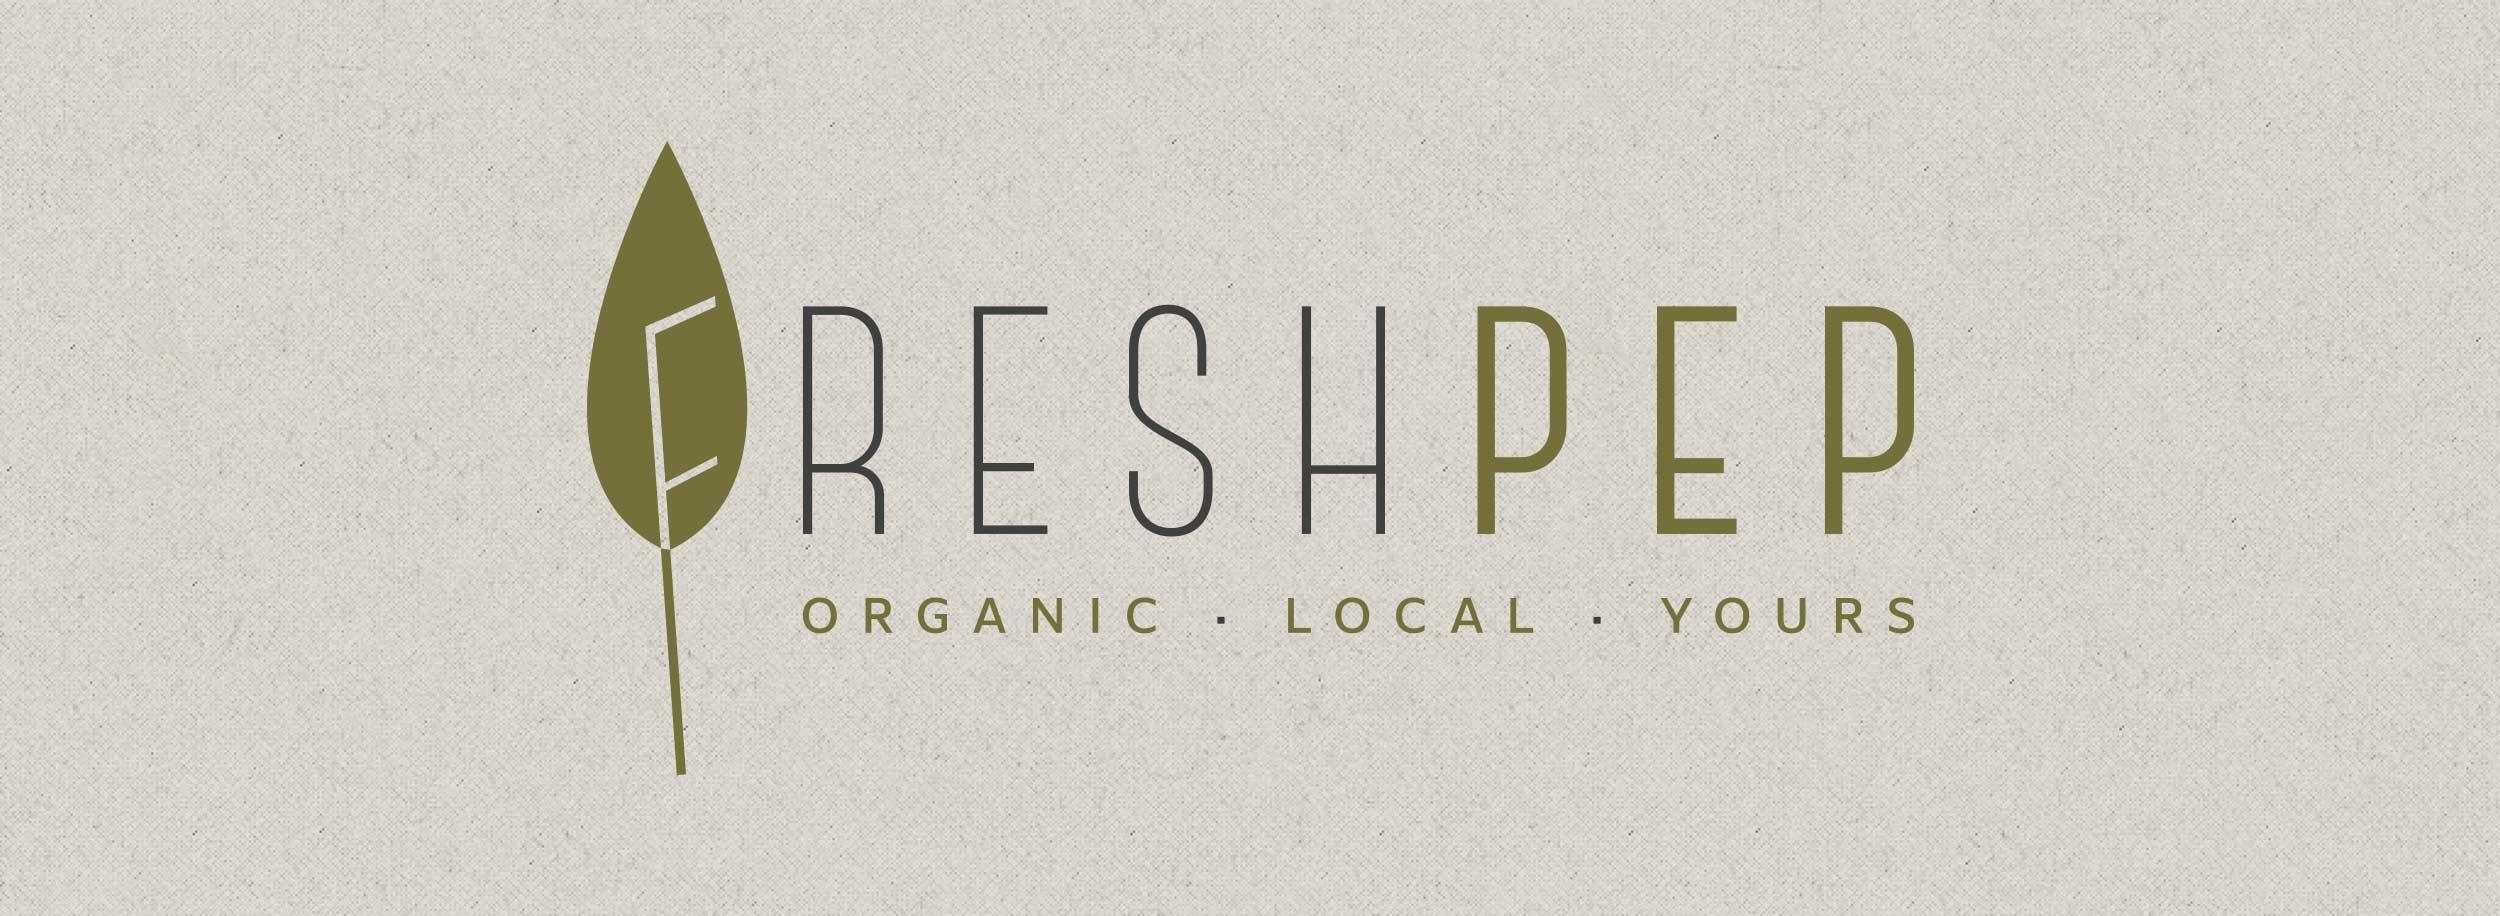 Nice logo that communicates the organic lifestyle values visually. © LET'S PANDA for freshpep